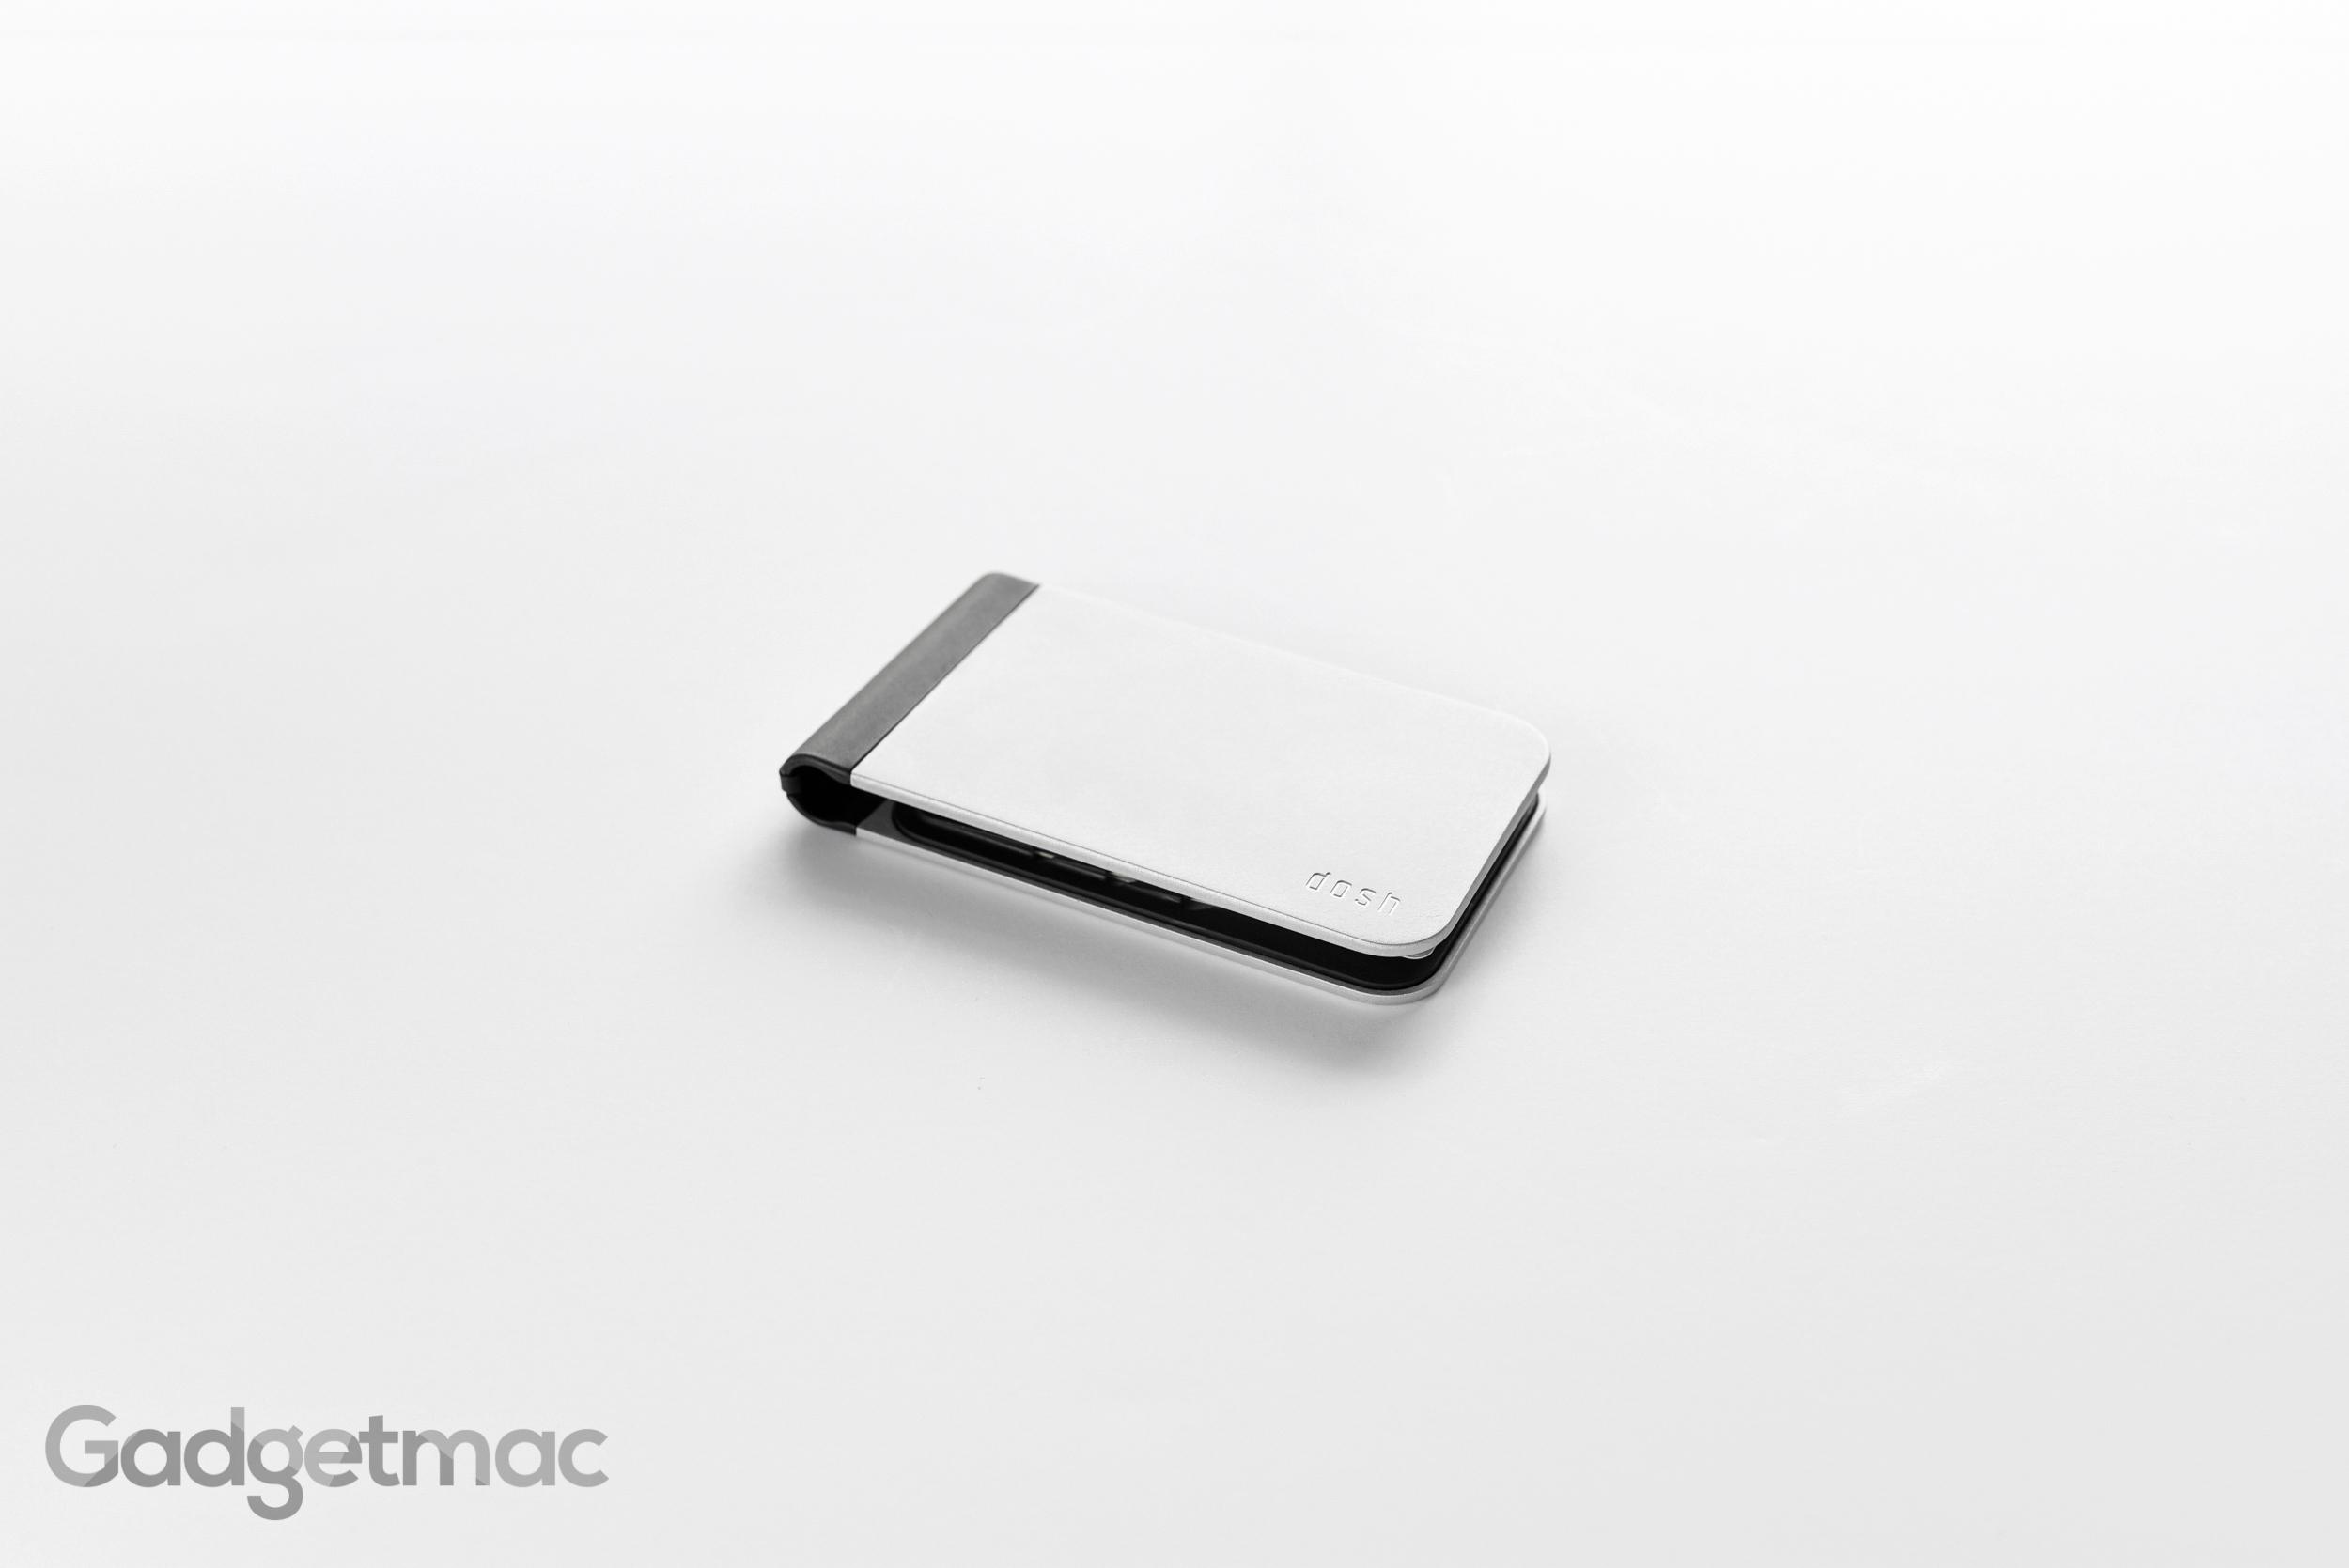 dosh_alloy_aluminum_card_wallet_slim_profile_1.jpg